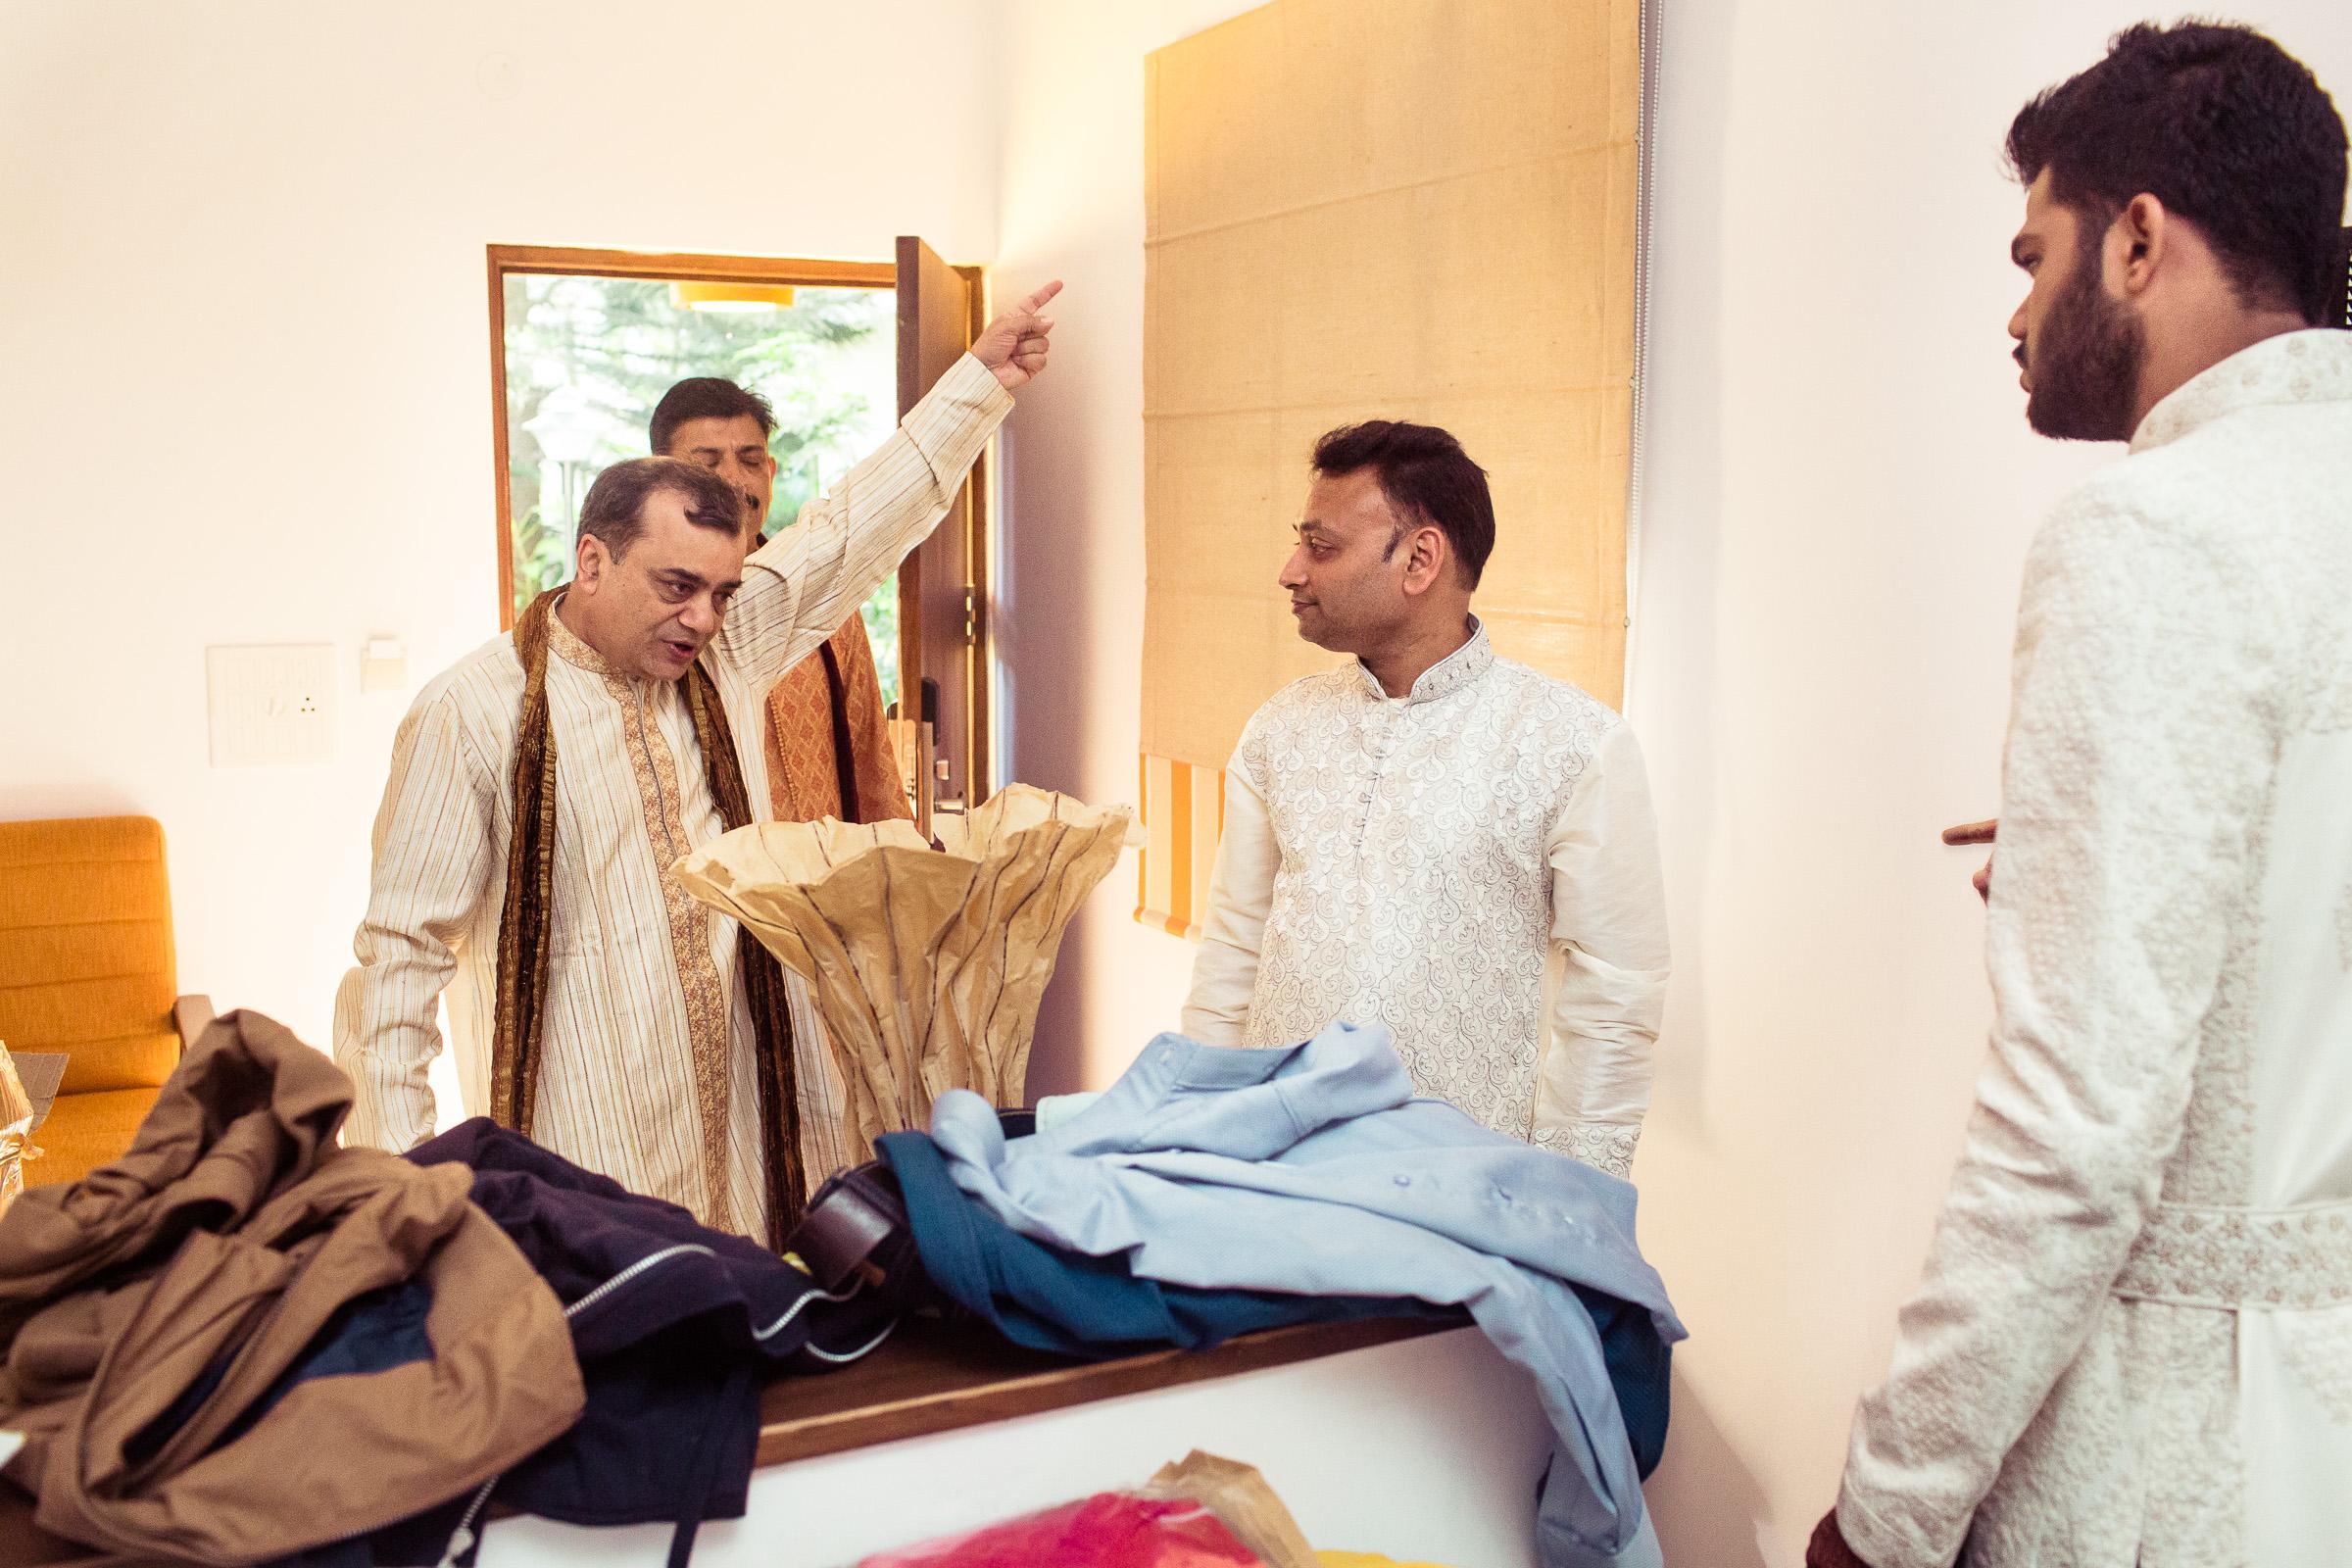 marwari-candid-wedding-photographers-bangalore-0004.jpg